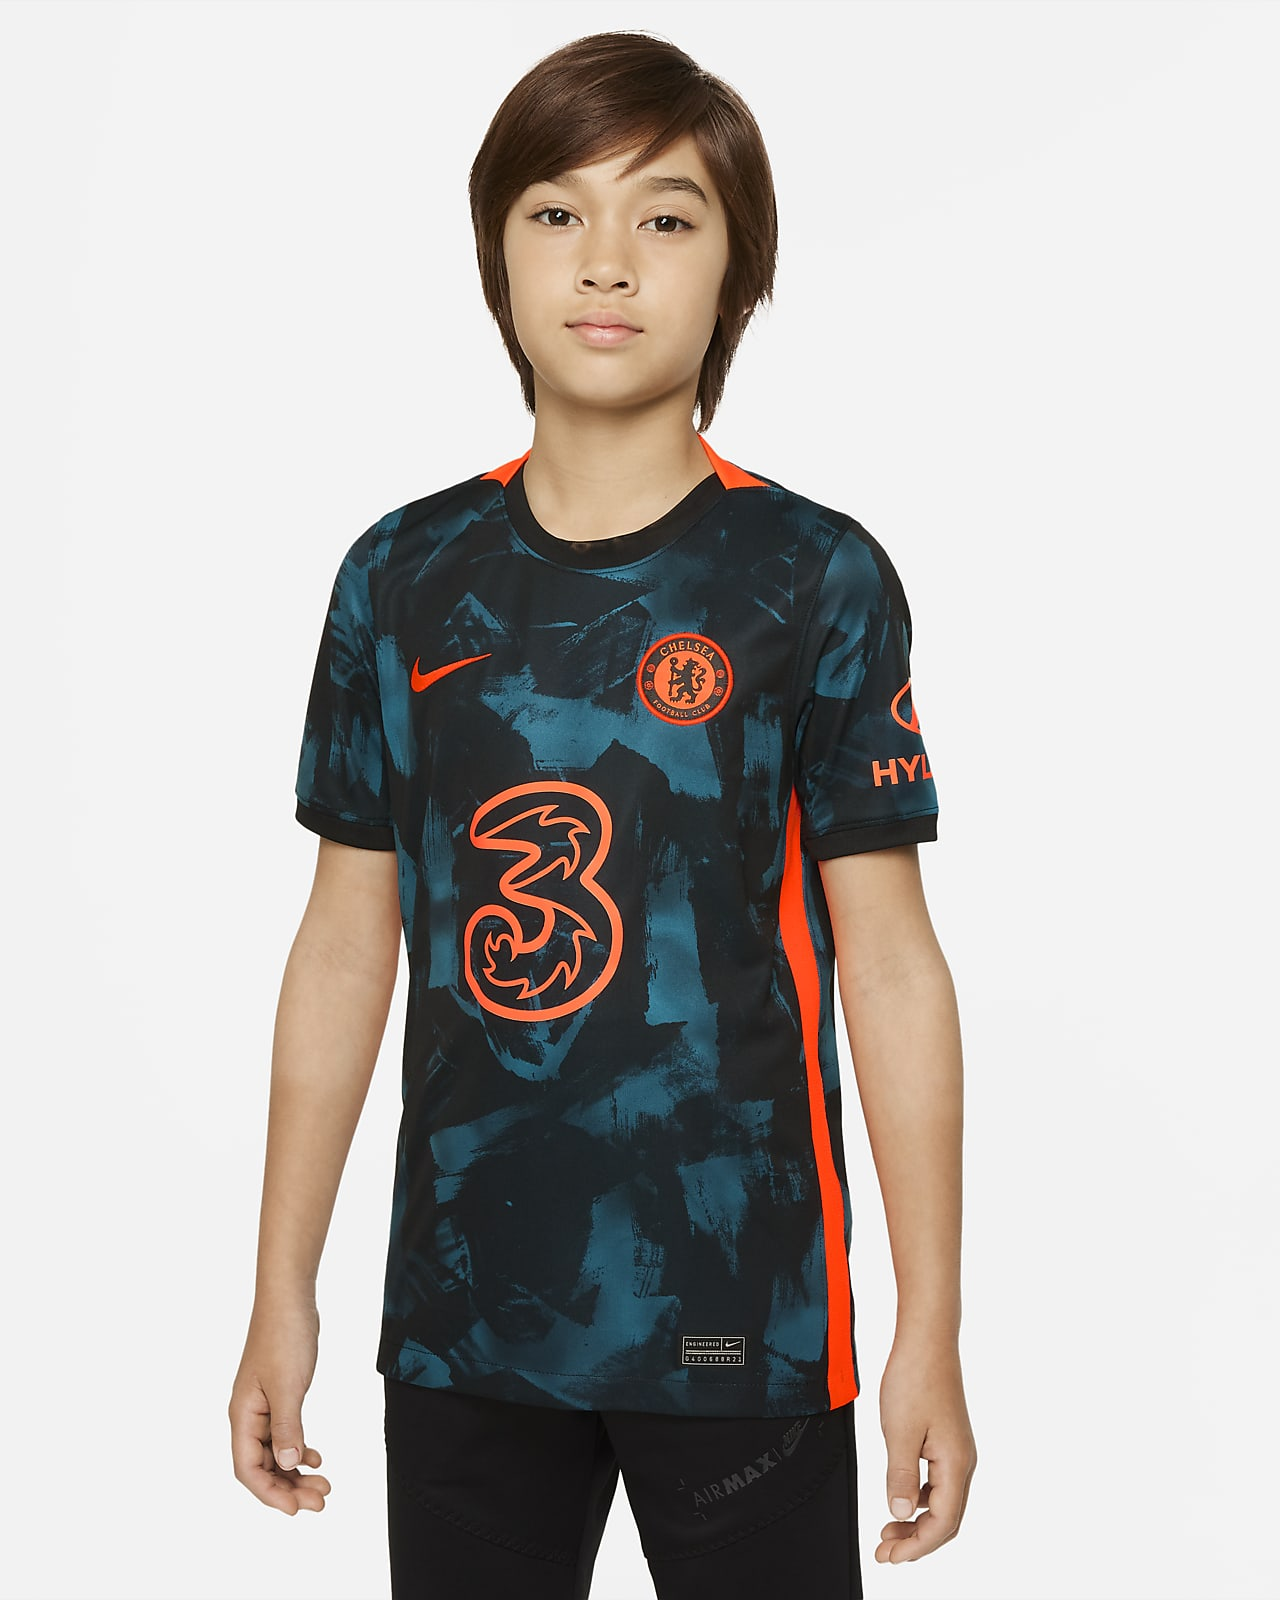 Chelsea F.C. 2021/22 Stadium Third Older Kids' Nike Dri-FIT Football Shirt